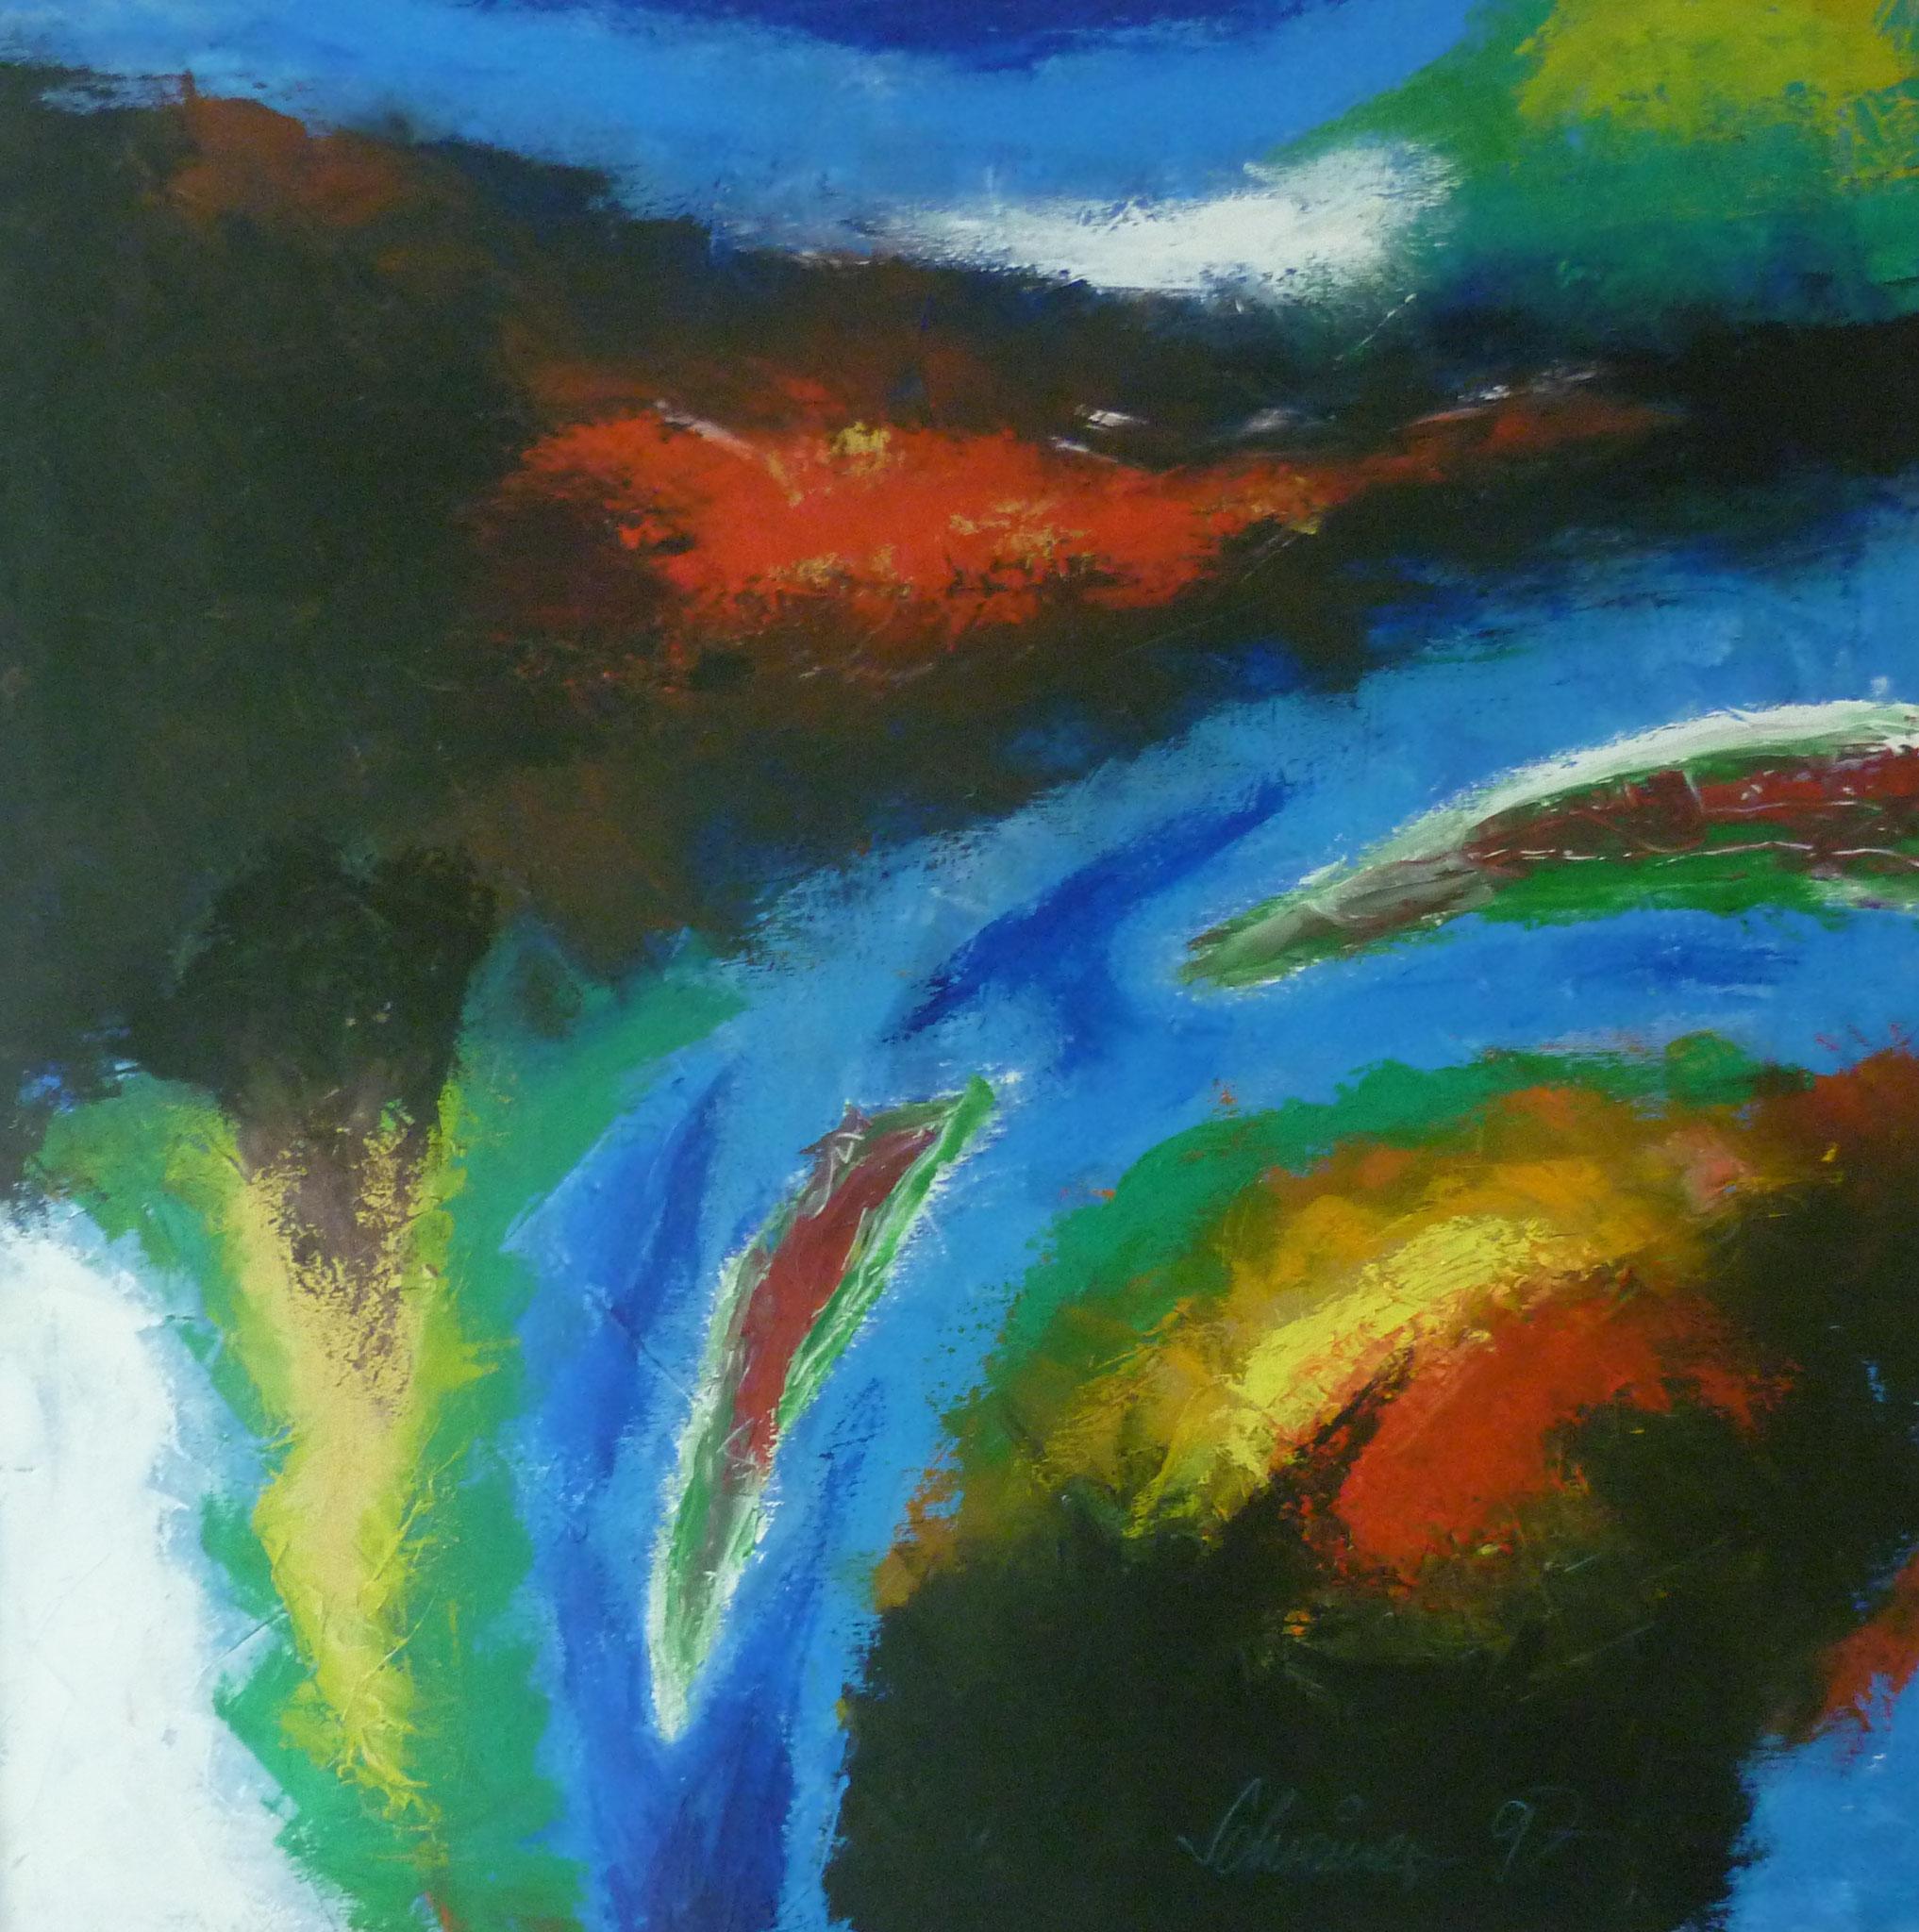 Landschaft abstrakt, Öl auf Leinwand, 75 x 75 cm